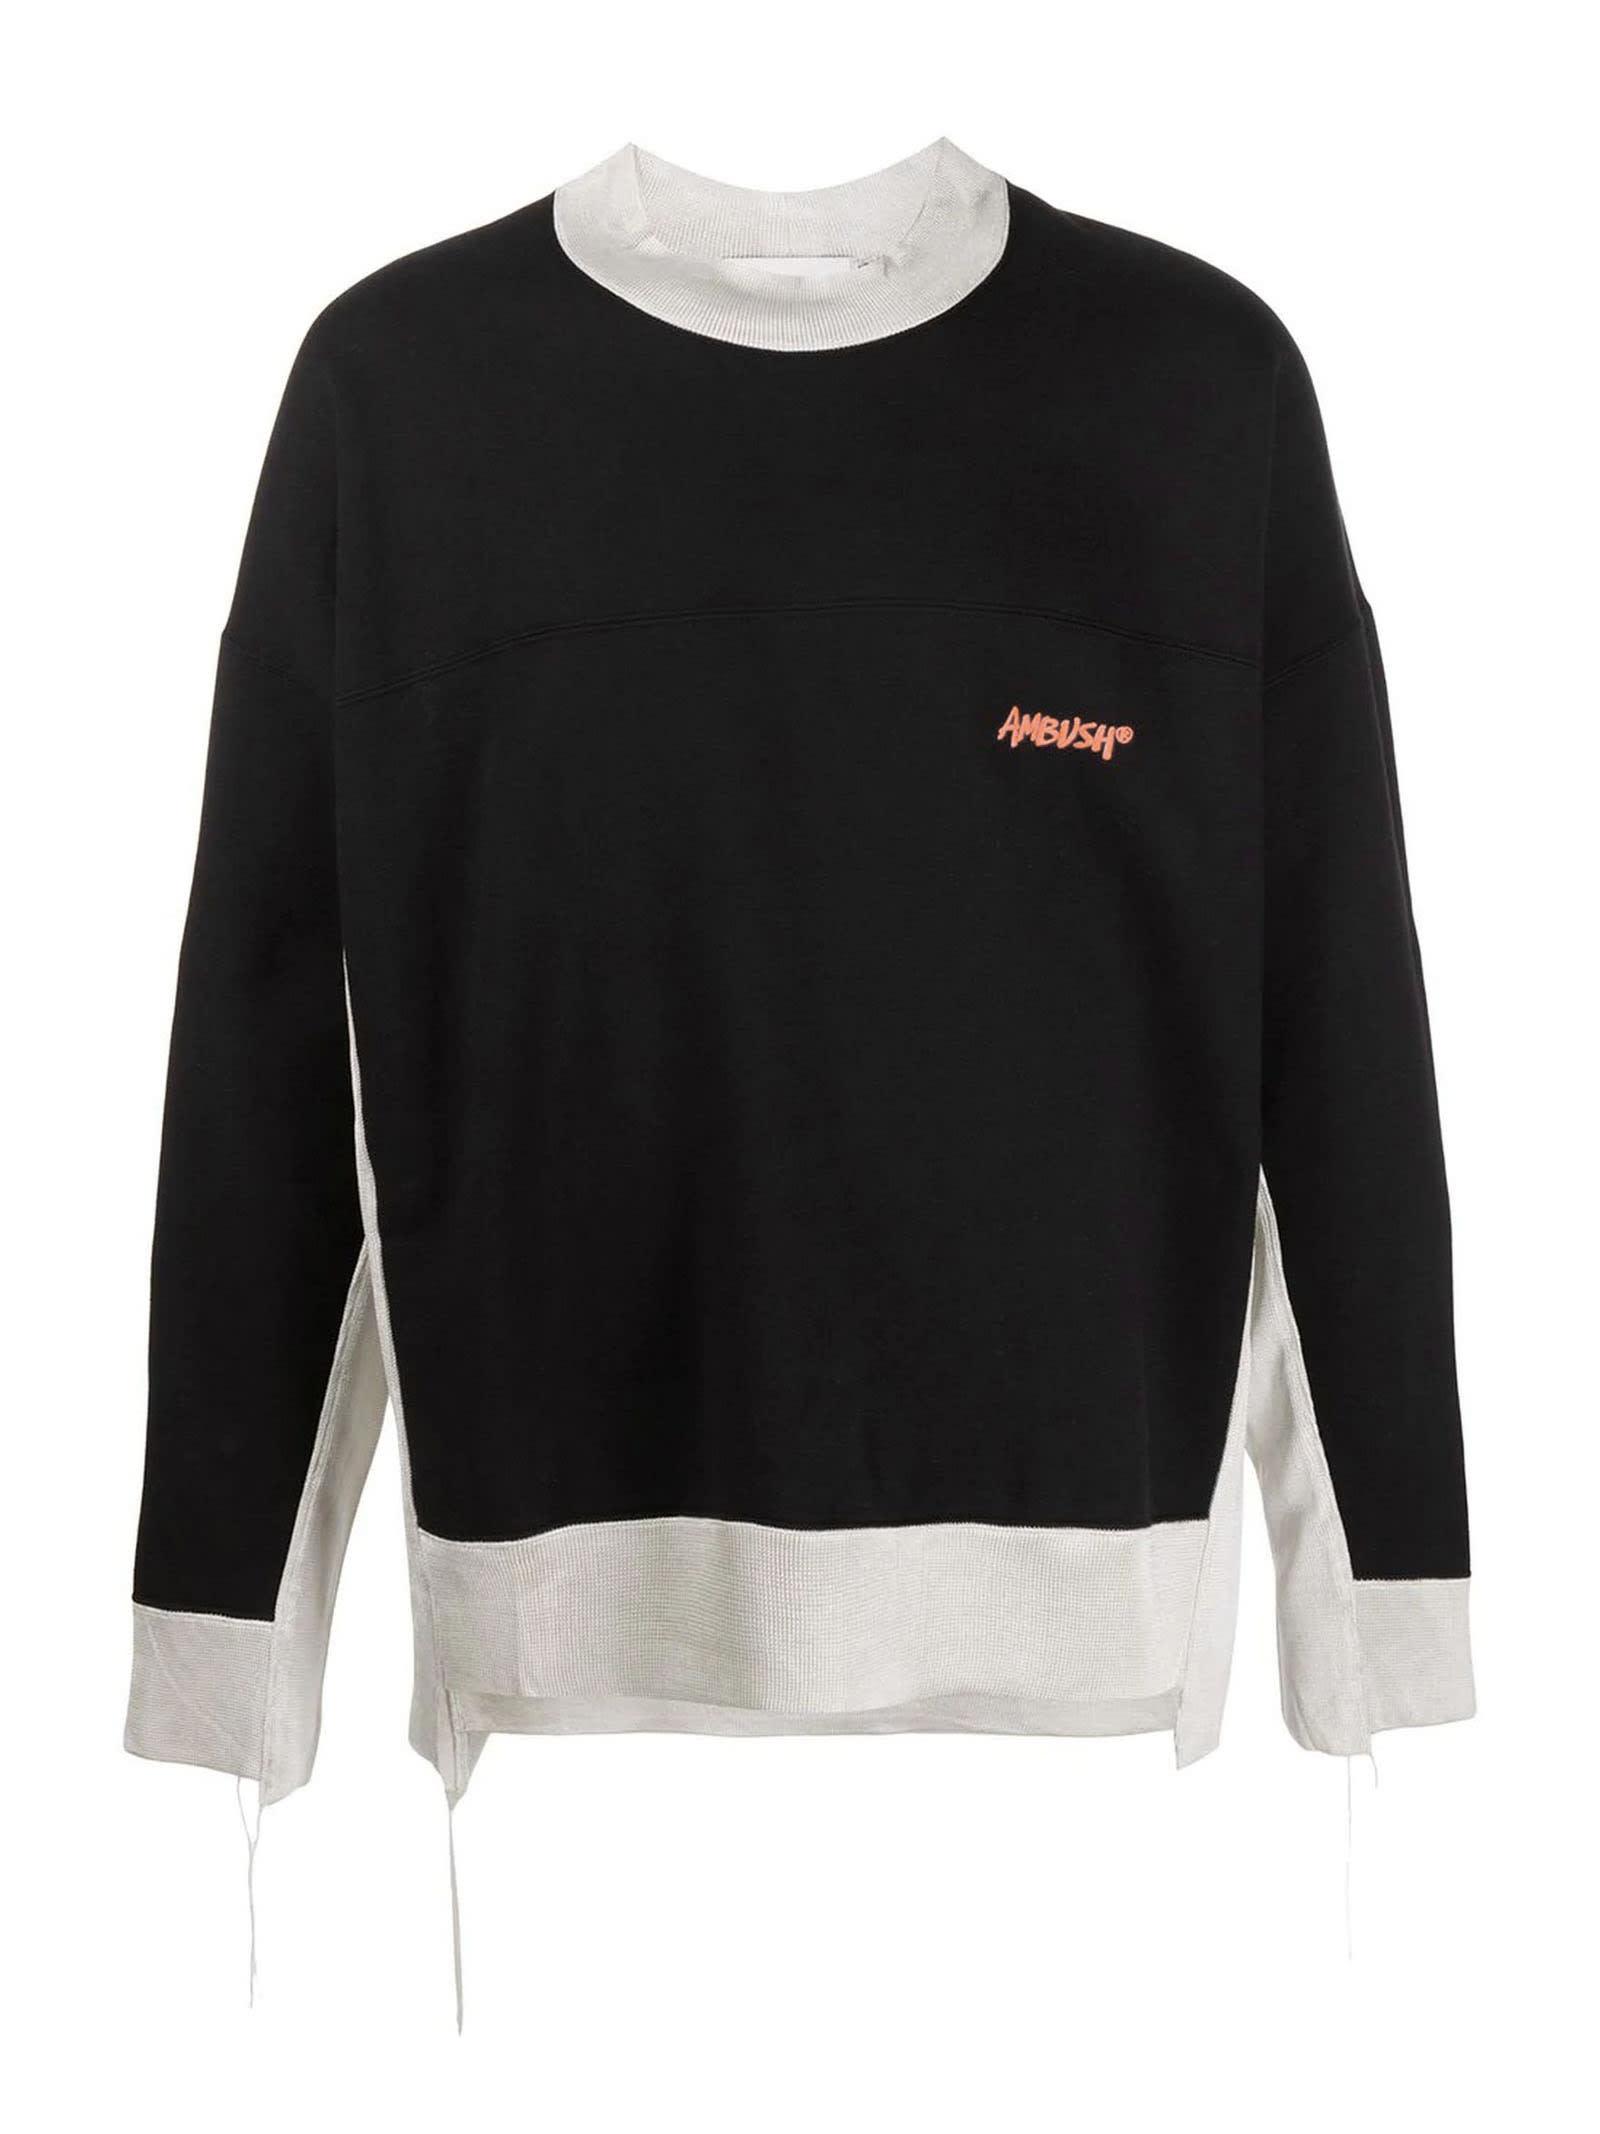 AMBUSH Black Cotton Blend Sweatshirt